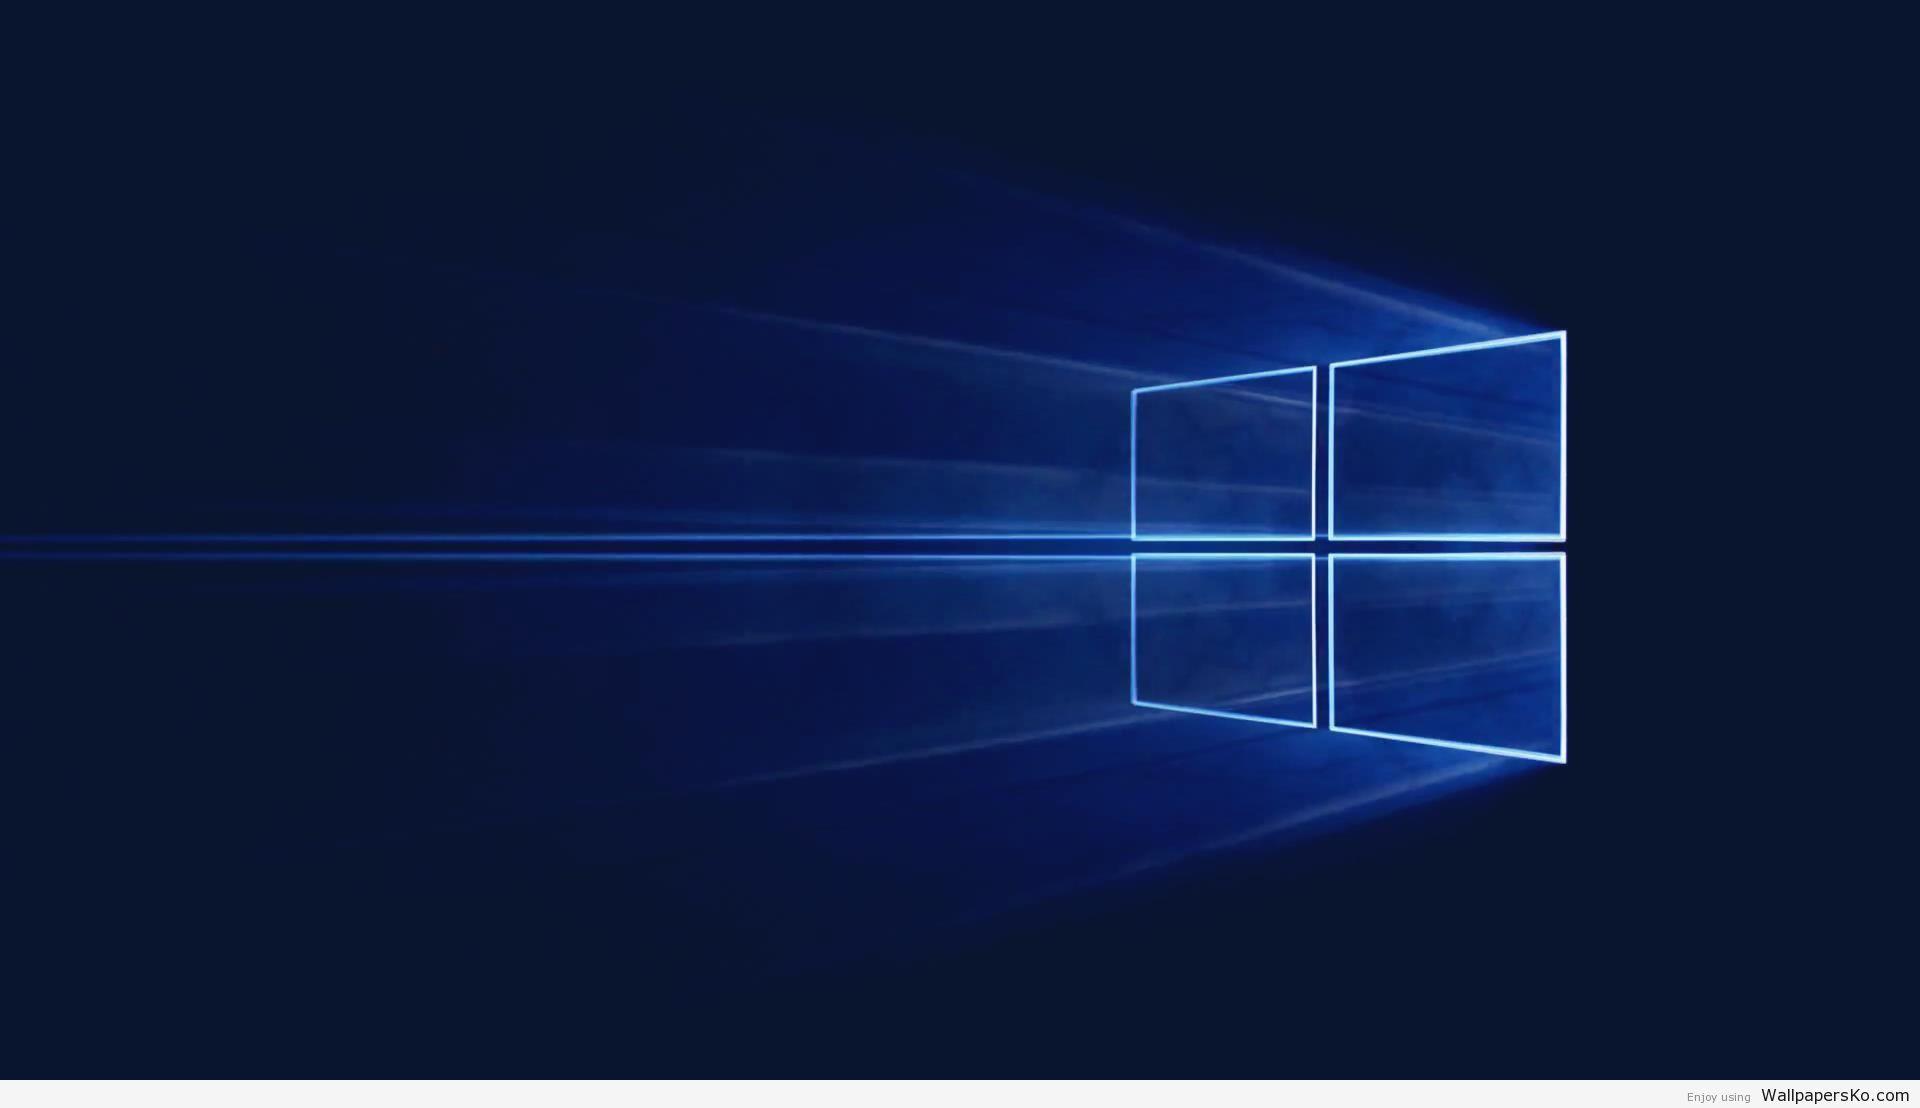 Windows 10 Desktop Background Http Wallpapersko Com Windows 10 Desktop Background Html Hd Wallpaper Windows 10 Windows 10 Desktop Backgrounds Wallpaper Pc